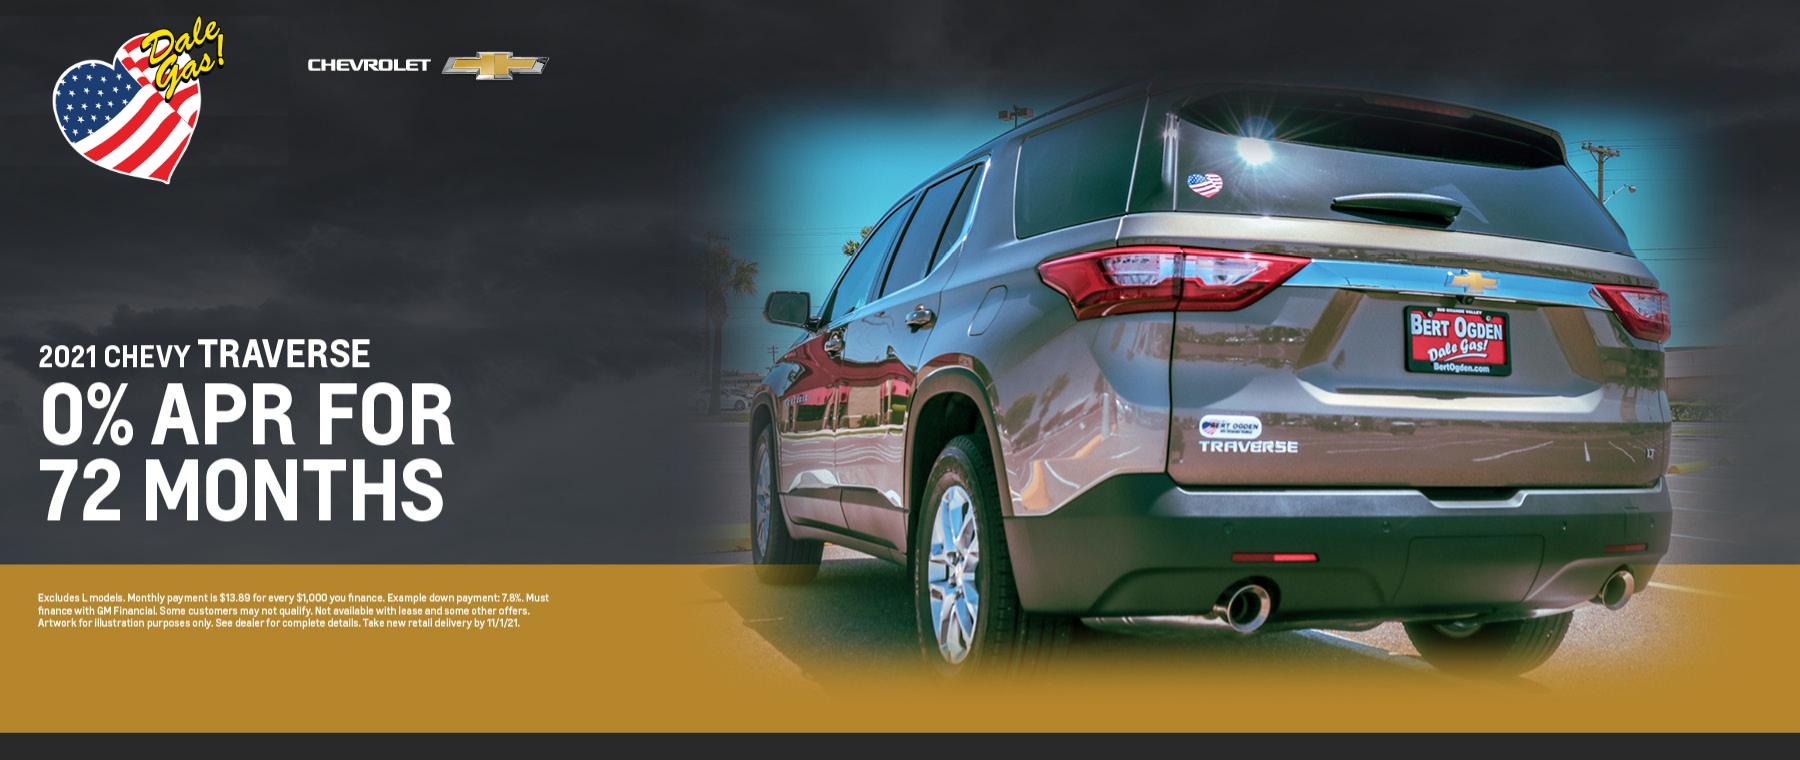 2021 Chevrolet Traverse Offer - October 2021